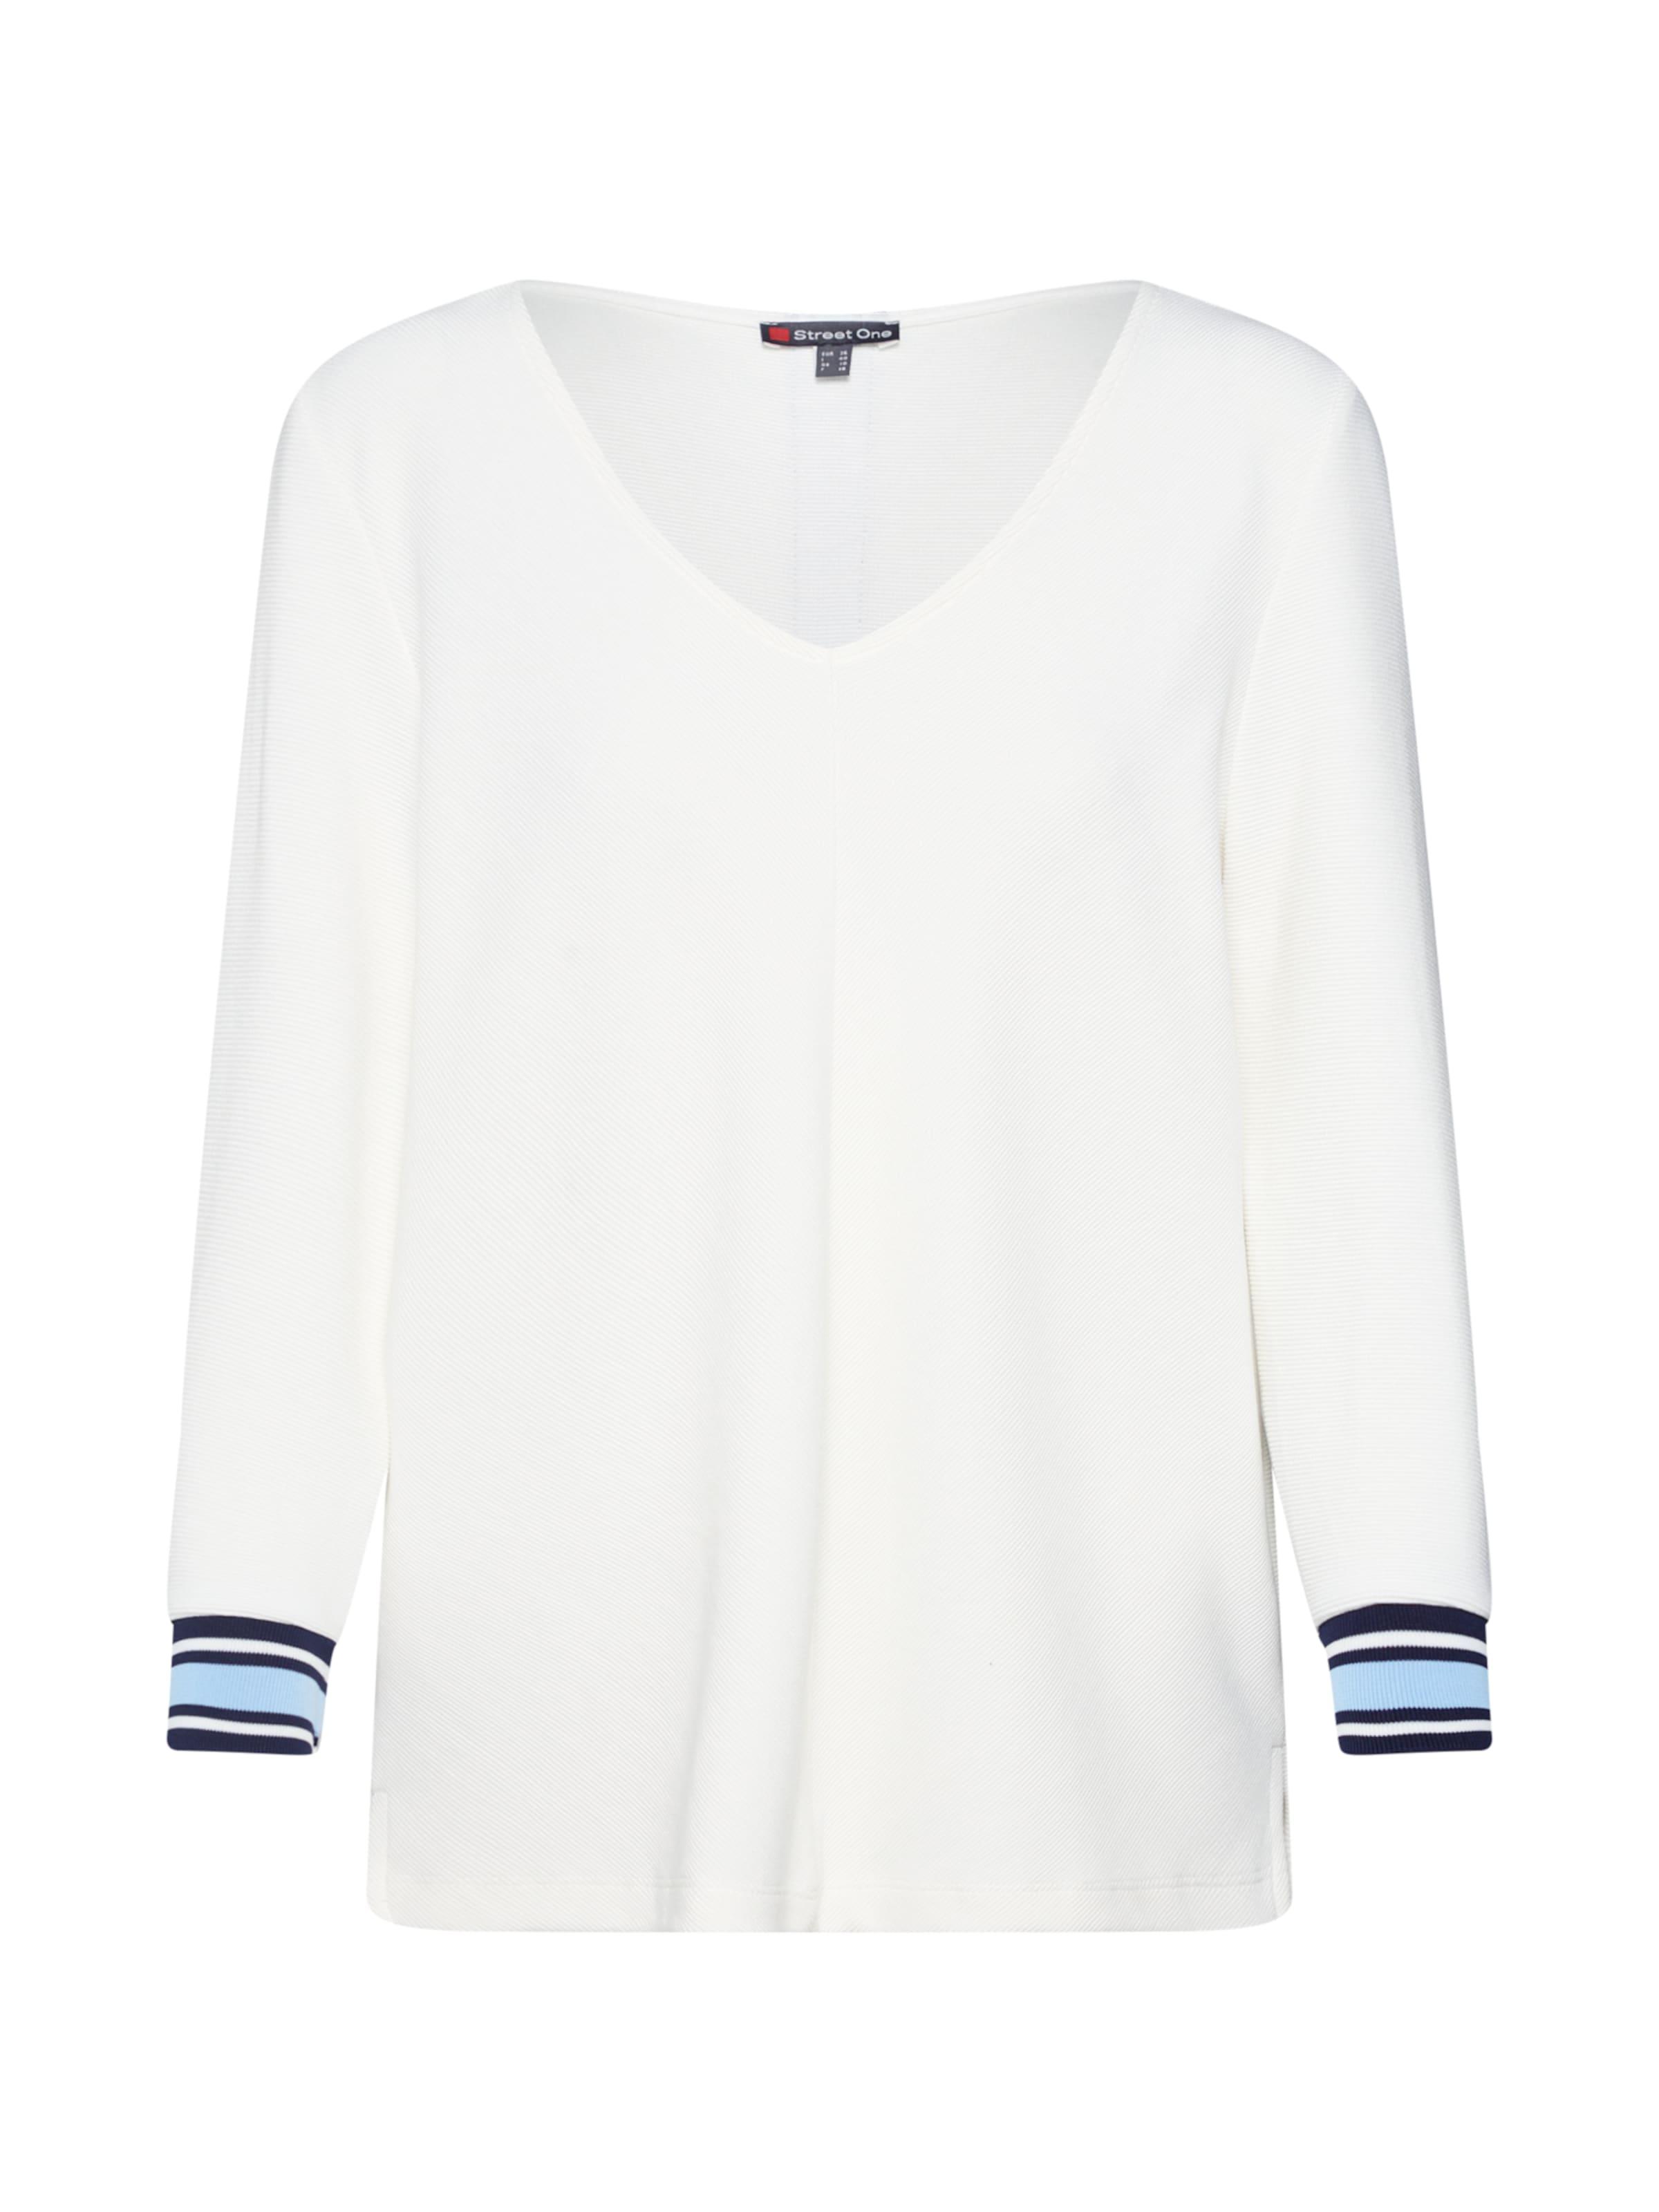 En T Blanc shirt Street One Cassé w0vN8ymnO